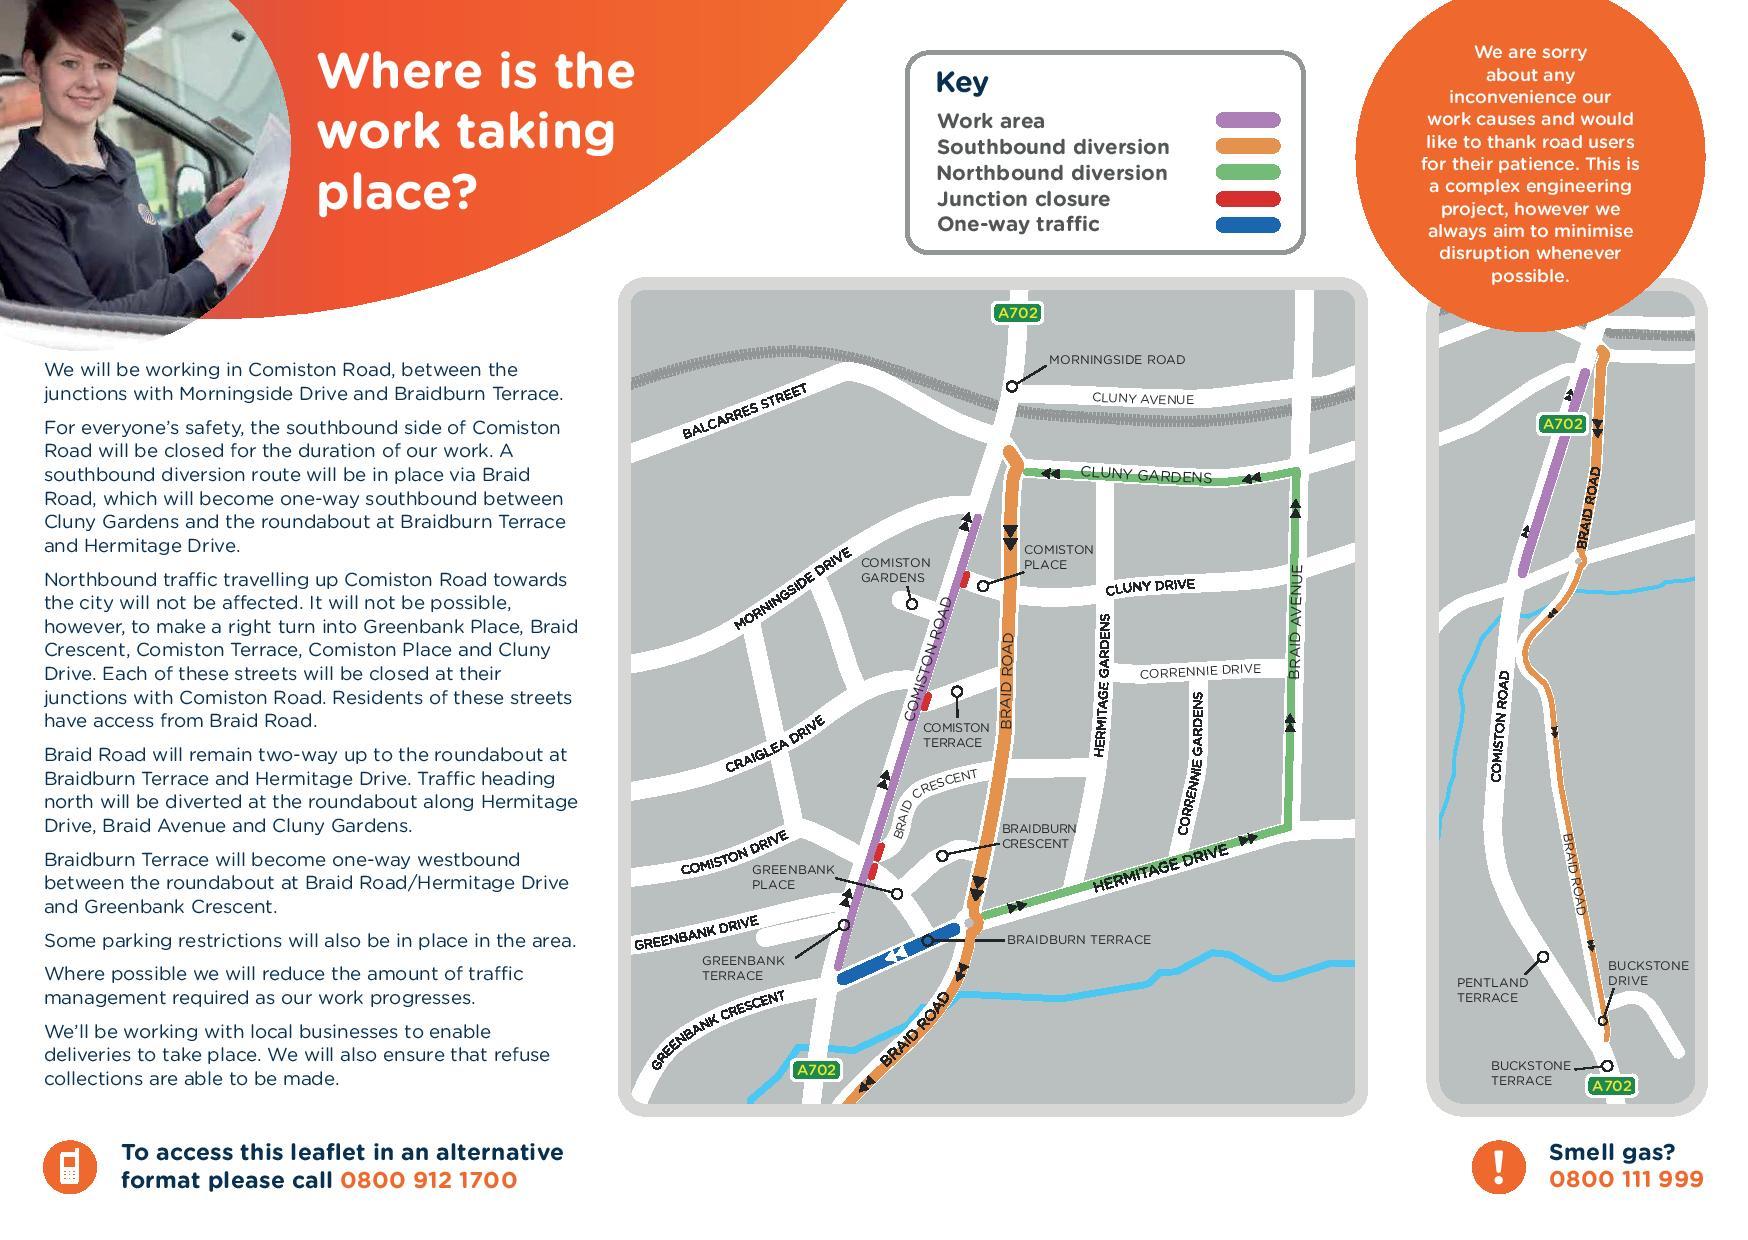 SGN_Customer_Leaflet_Comiston_Road_A702_Edinburgh_160509-page-002.jpg